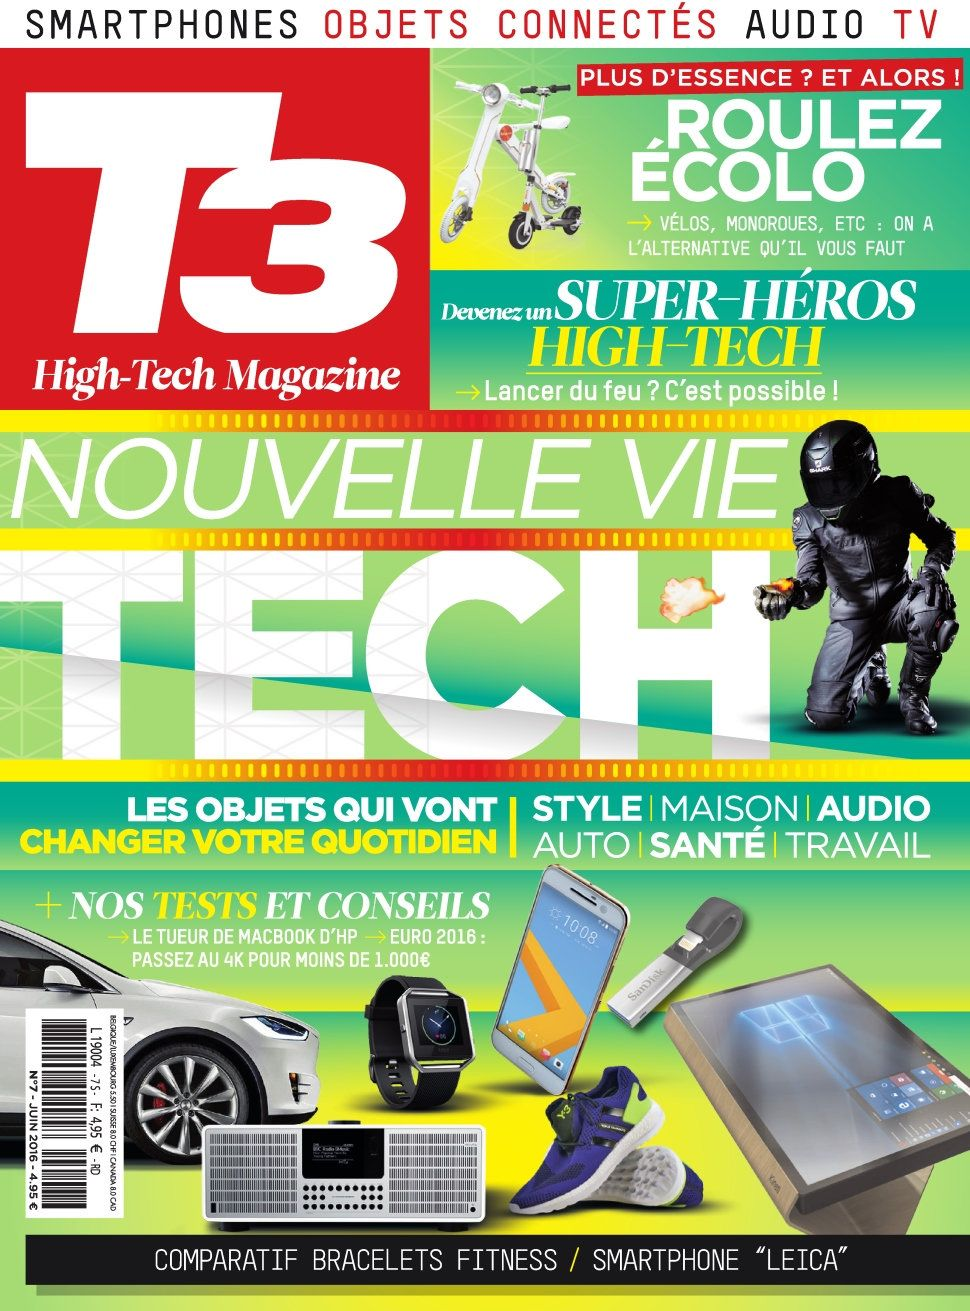 T3 HighTech Magazine 7 - Juin 2016